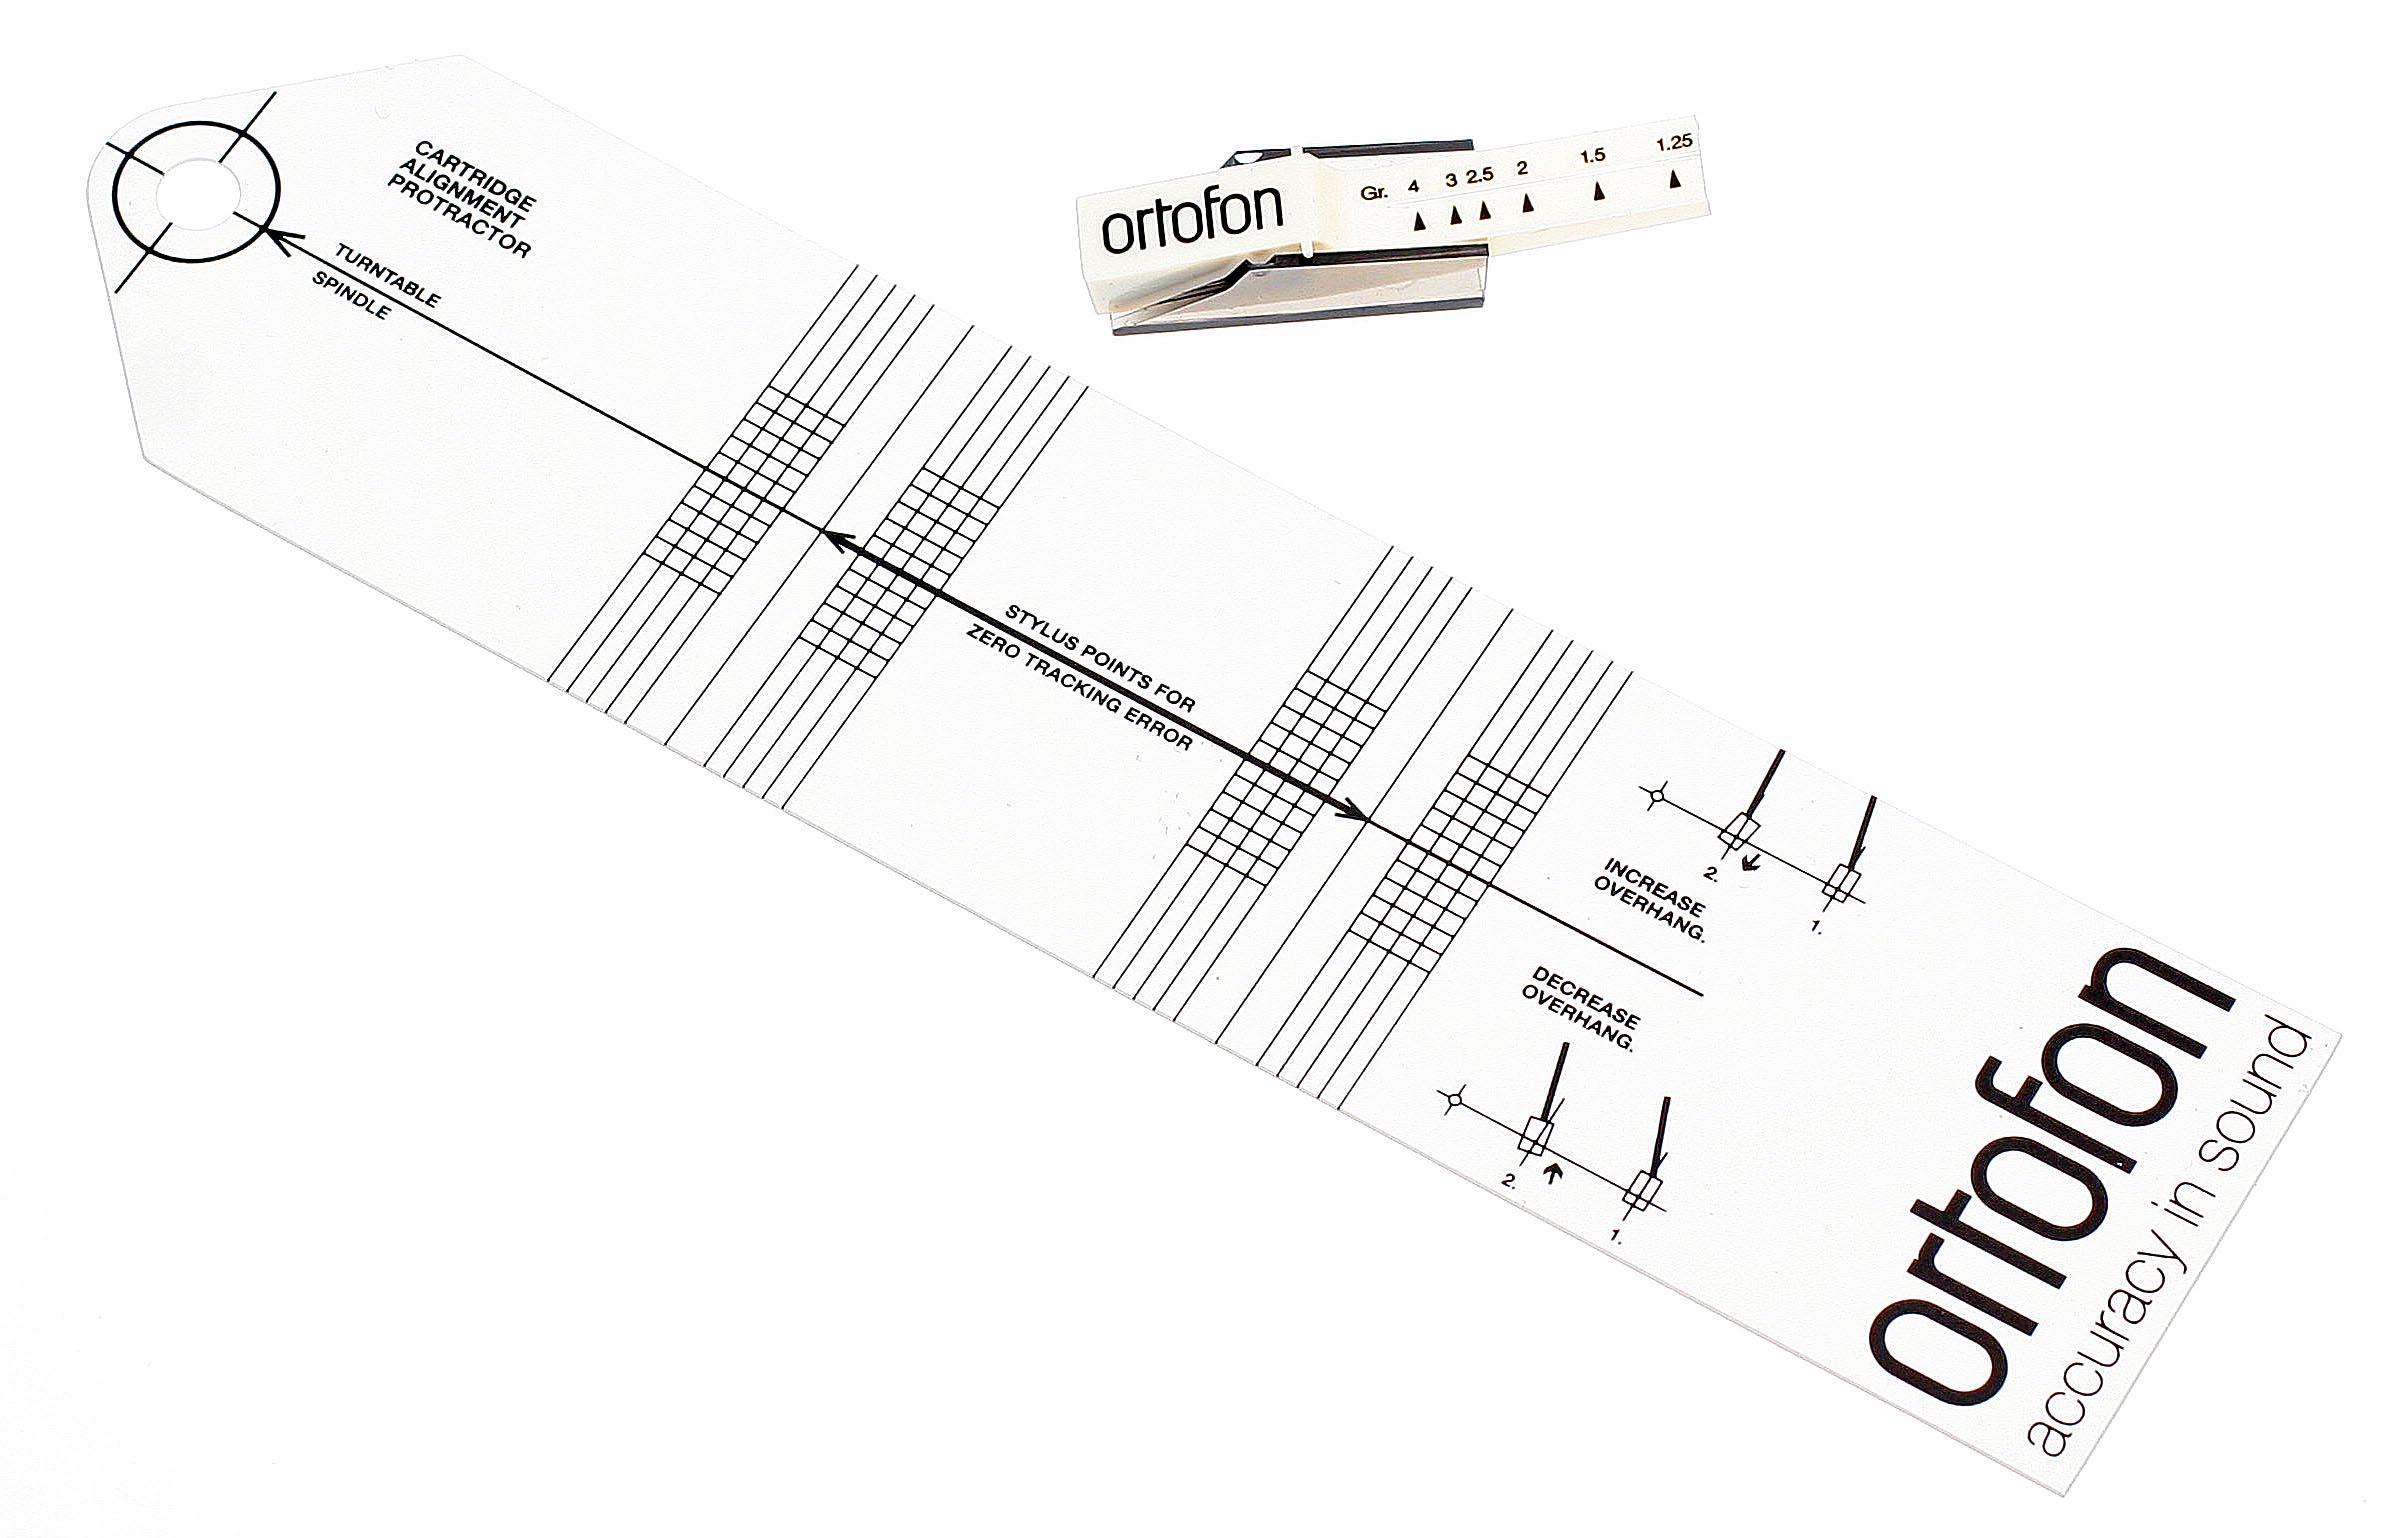 ortofon  u00dcberhangschablone  u0026 tonarmwaage set